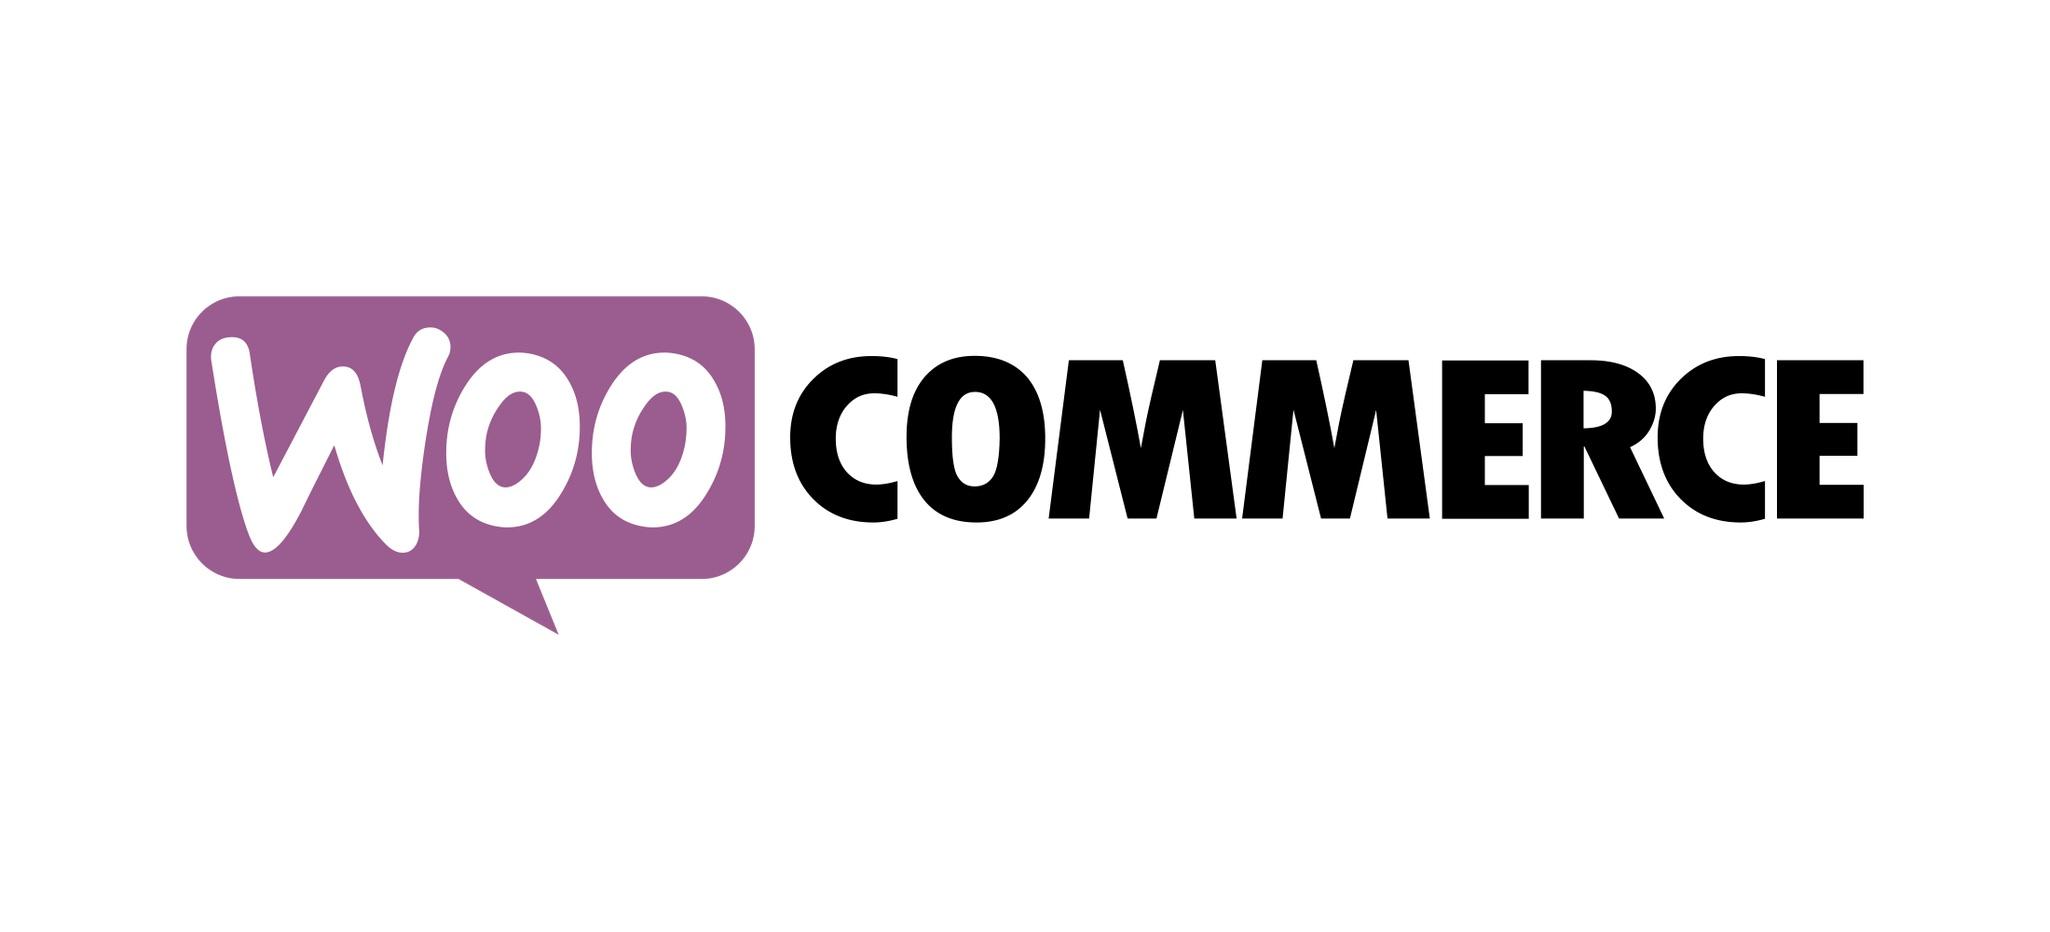 woocommerce-logo WooCommerce修补了允许垃圾邮件机器人在结帐时创建帐户的漏洞